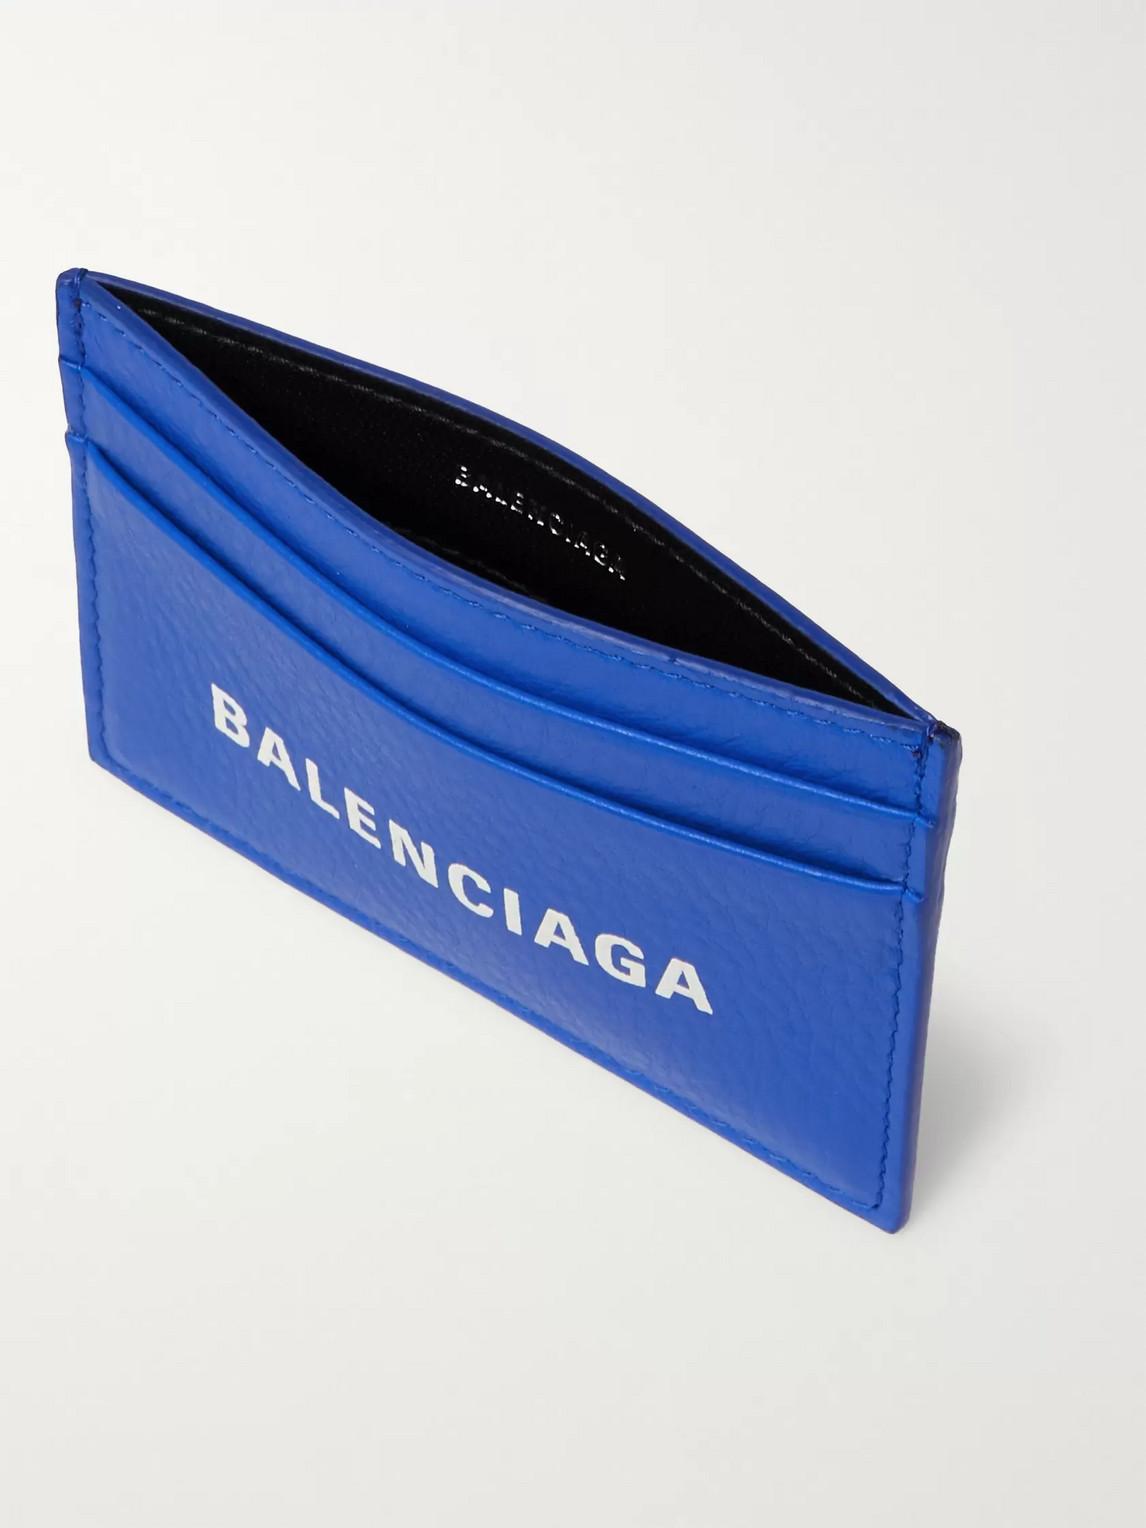 Balenciaga Accessories LOGO-PRINT FULL-GRAIN LEATHER CARDHOLDER